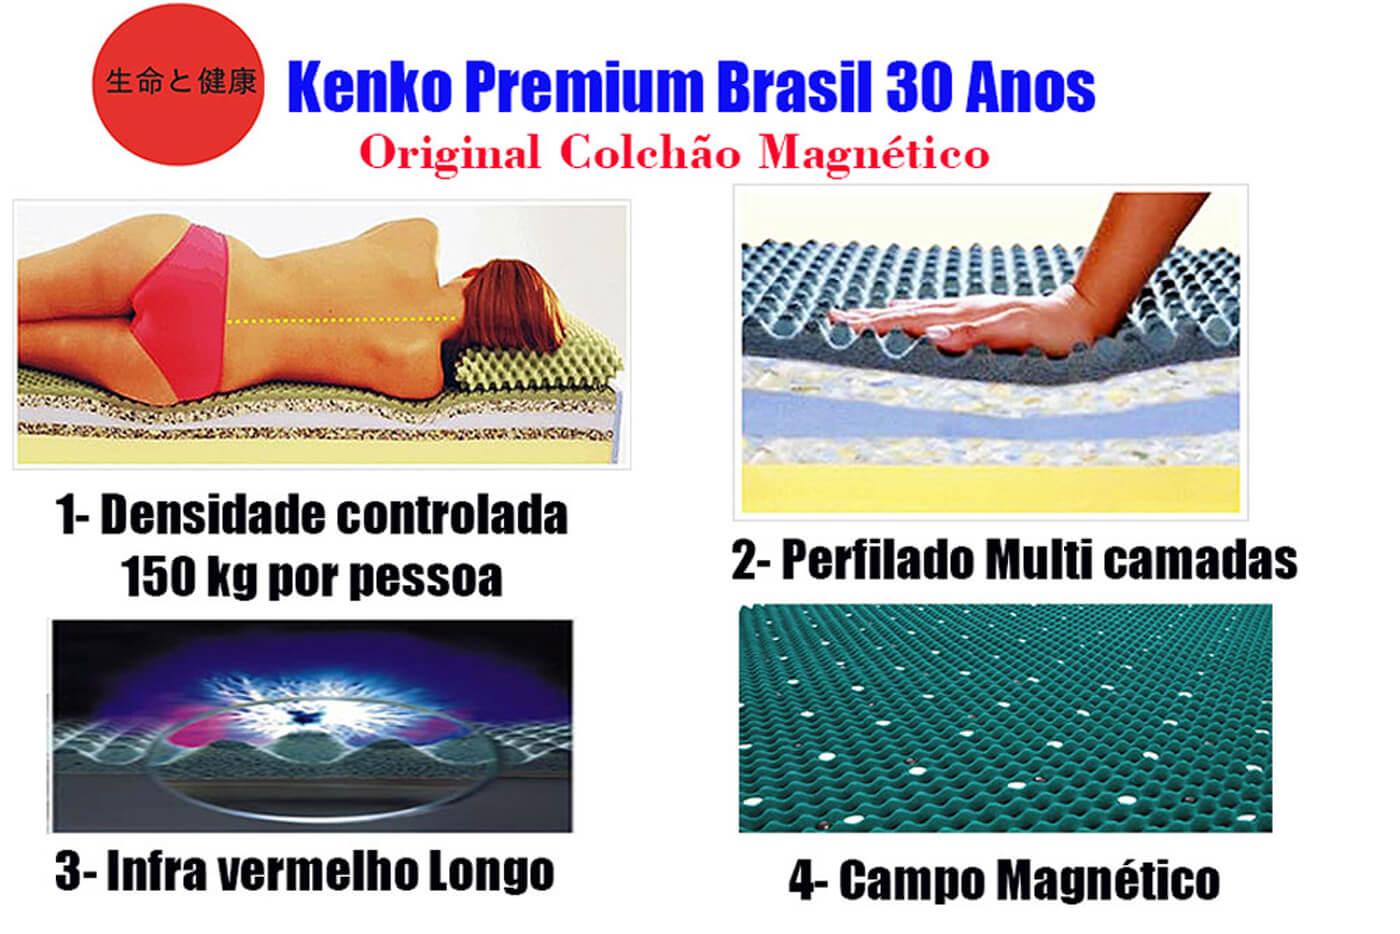 Manta Magnética Colchonete Kenko Premium King Size 1,93x2,03x10cm  - Kenko Premium Colchões